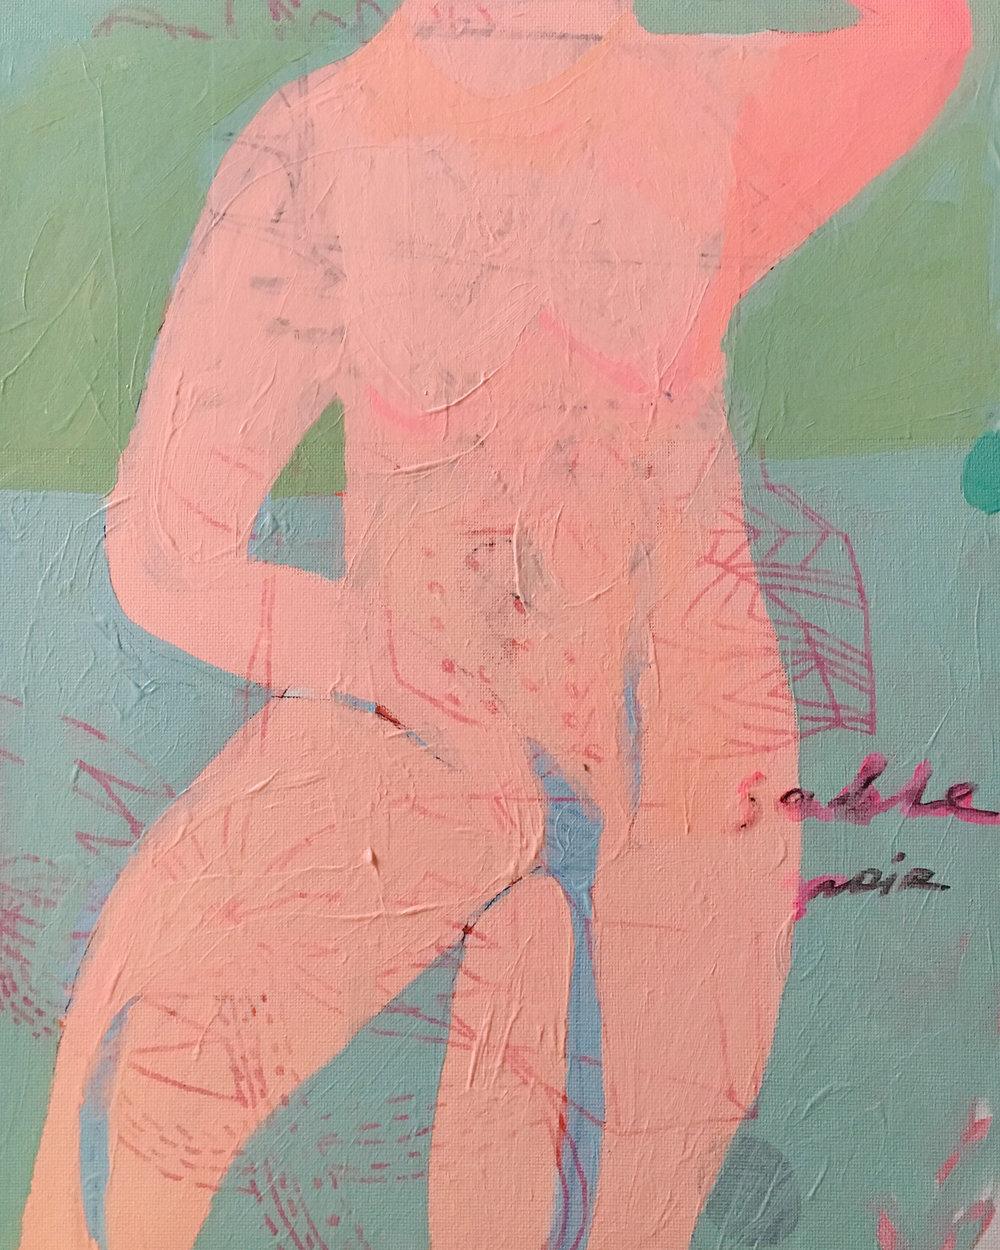 Sable Noir, Acrylic and Cardboard on Canvas, 40 x 30 cm, £959  Enquires:  olia@luminairearts.co.uk